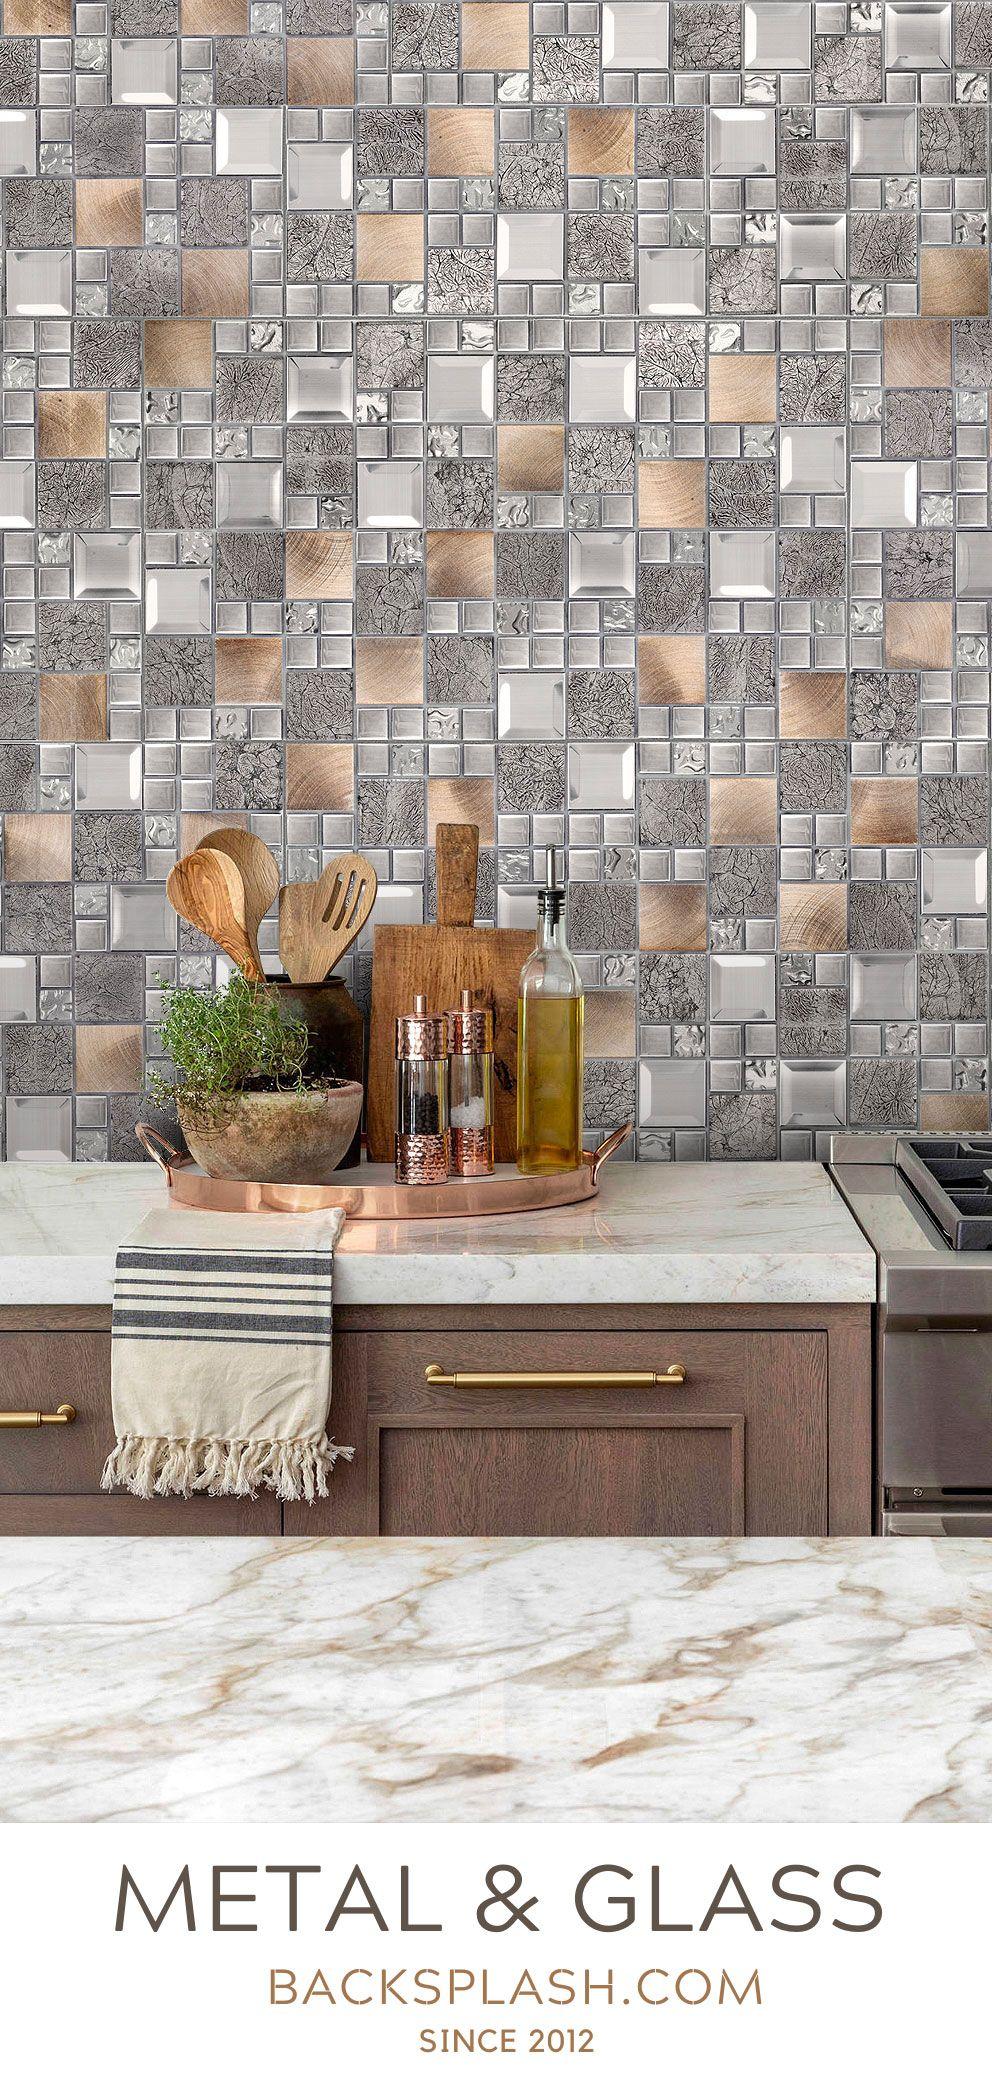 22 Brown Kitchen Backsplash Tiles Ideas Backsplash Brown Tiles Kitchen Backsplash